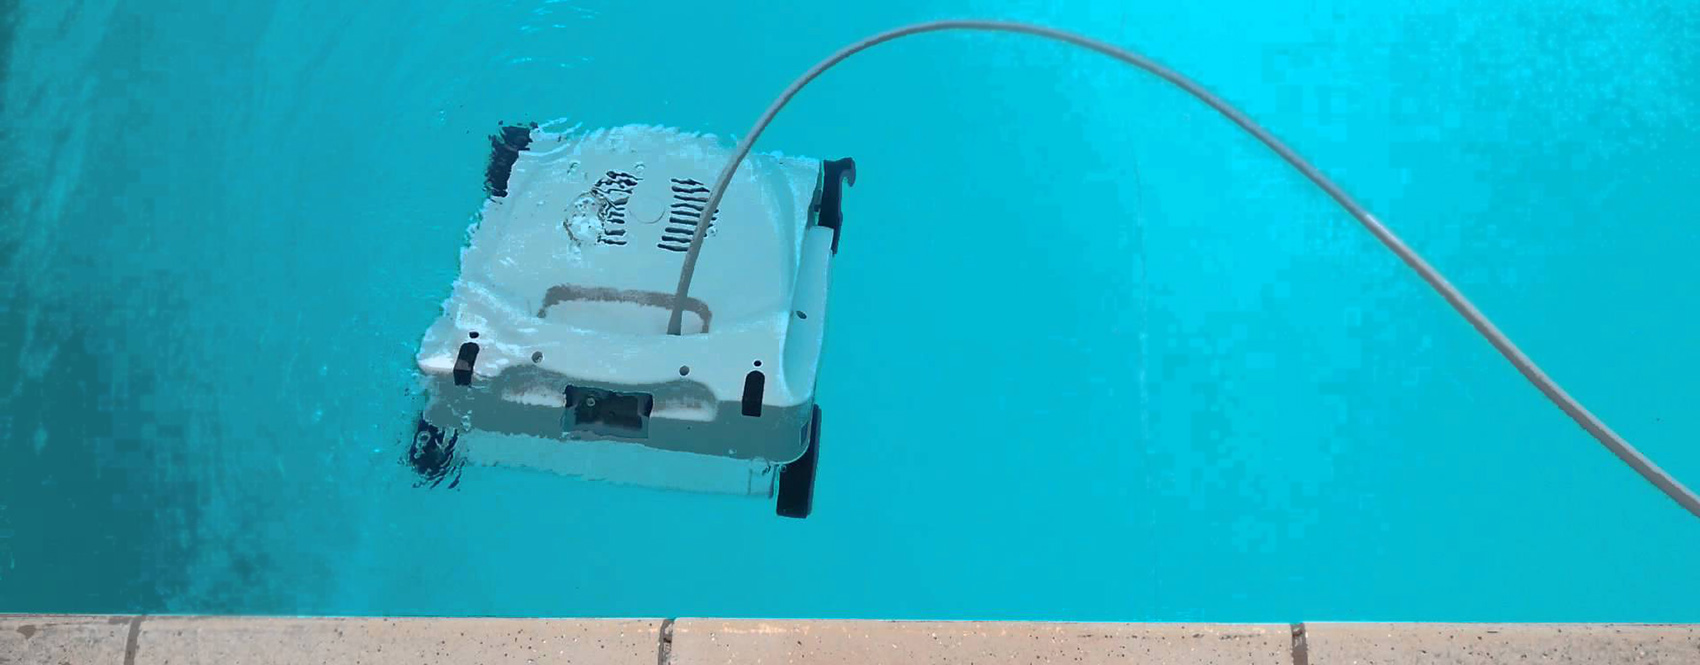 Entretien maintenance piscine vend e chauffage installation 85 Piscine entretien